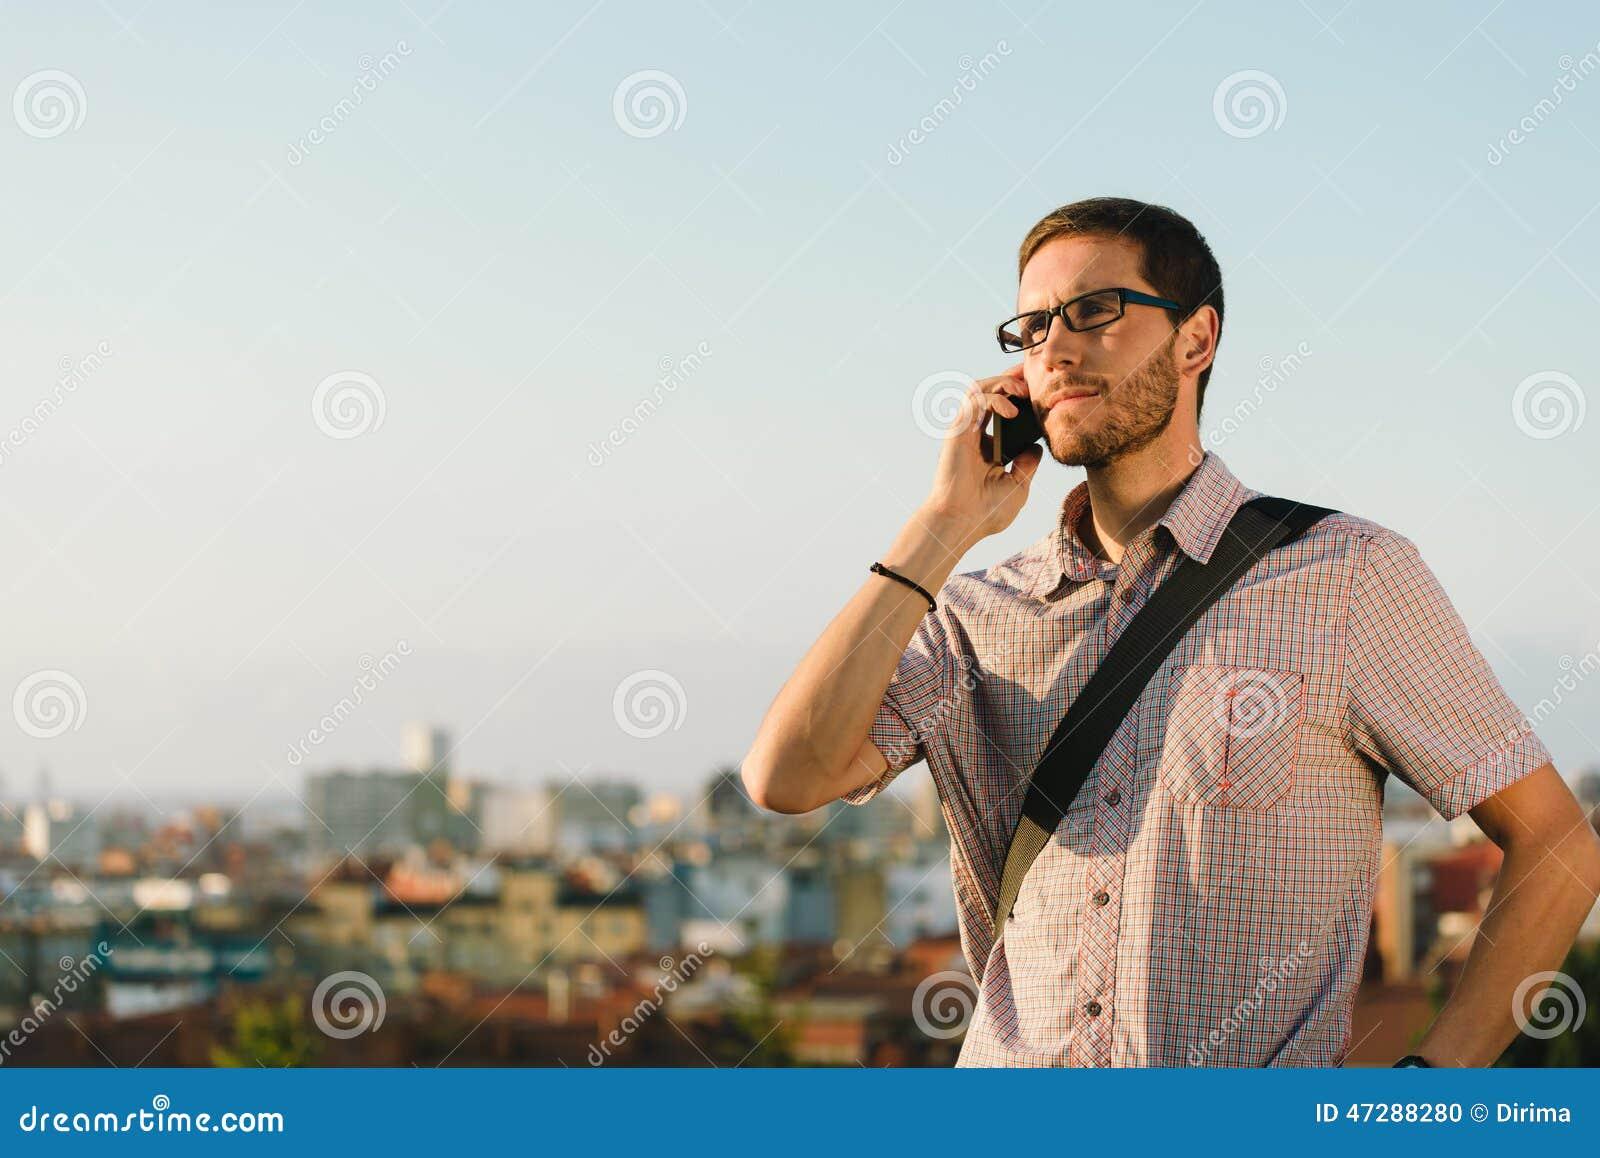 professional casual man on cellphone job call stock photo image professional casual man on cellphone job call